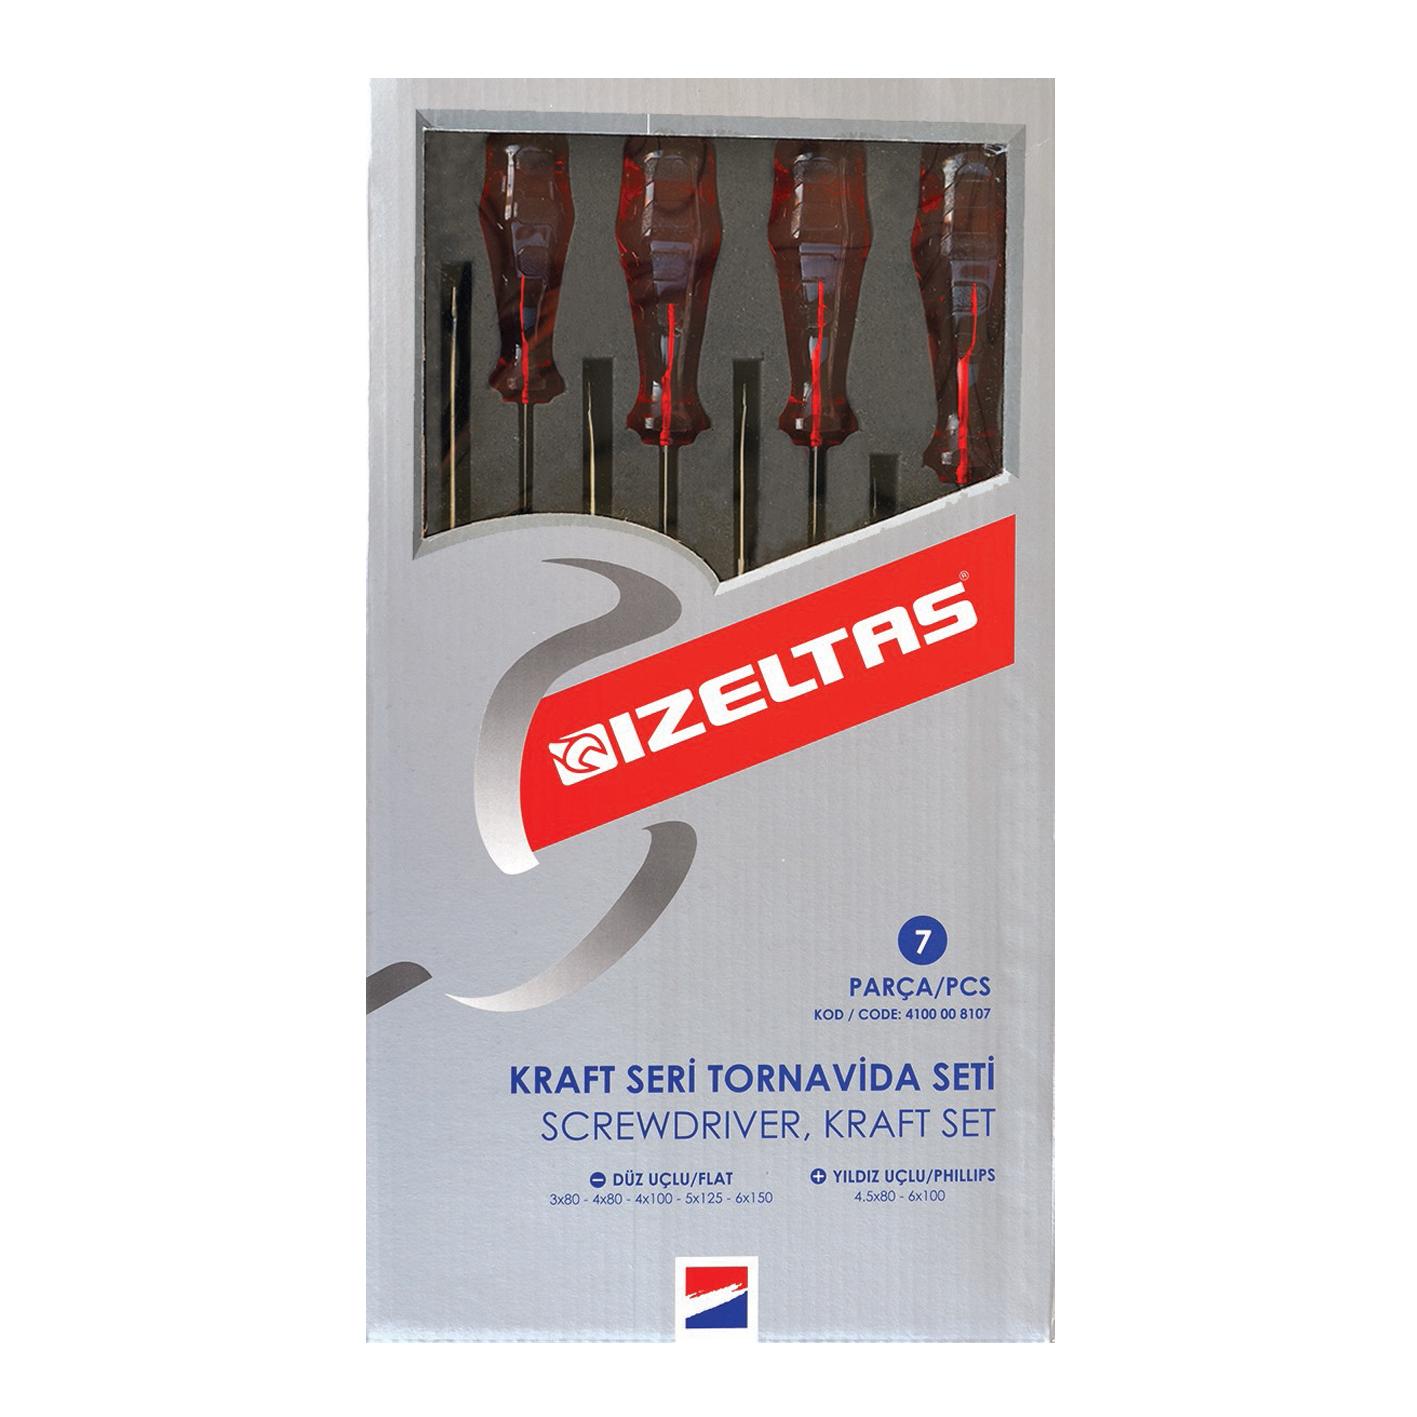 İzeltaş 7 Parça Tornavida Seti Kraft Seri